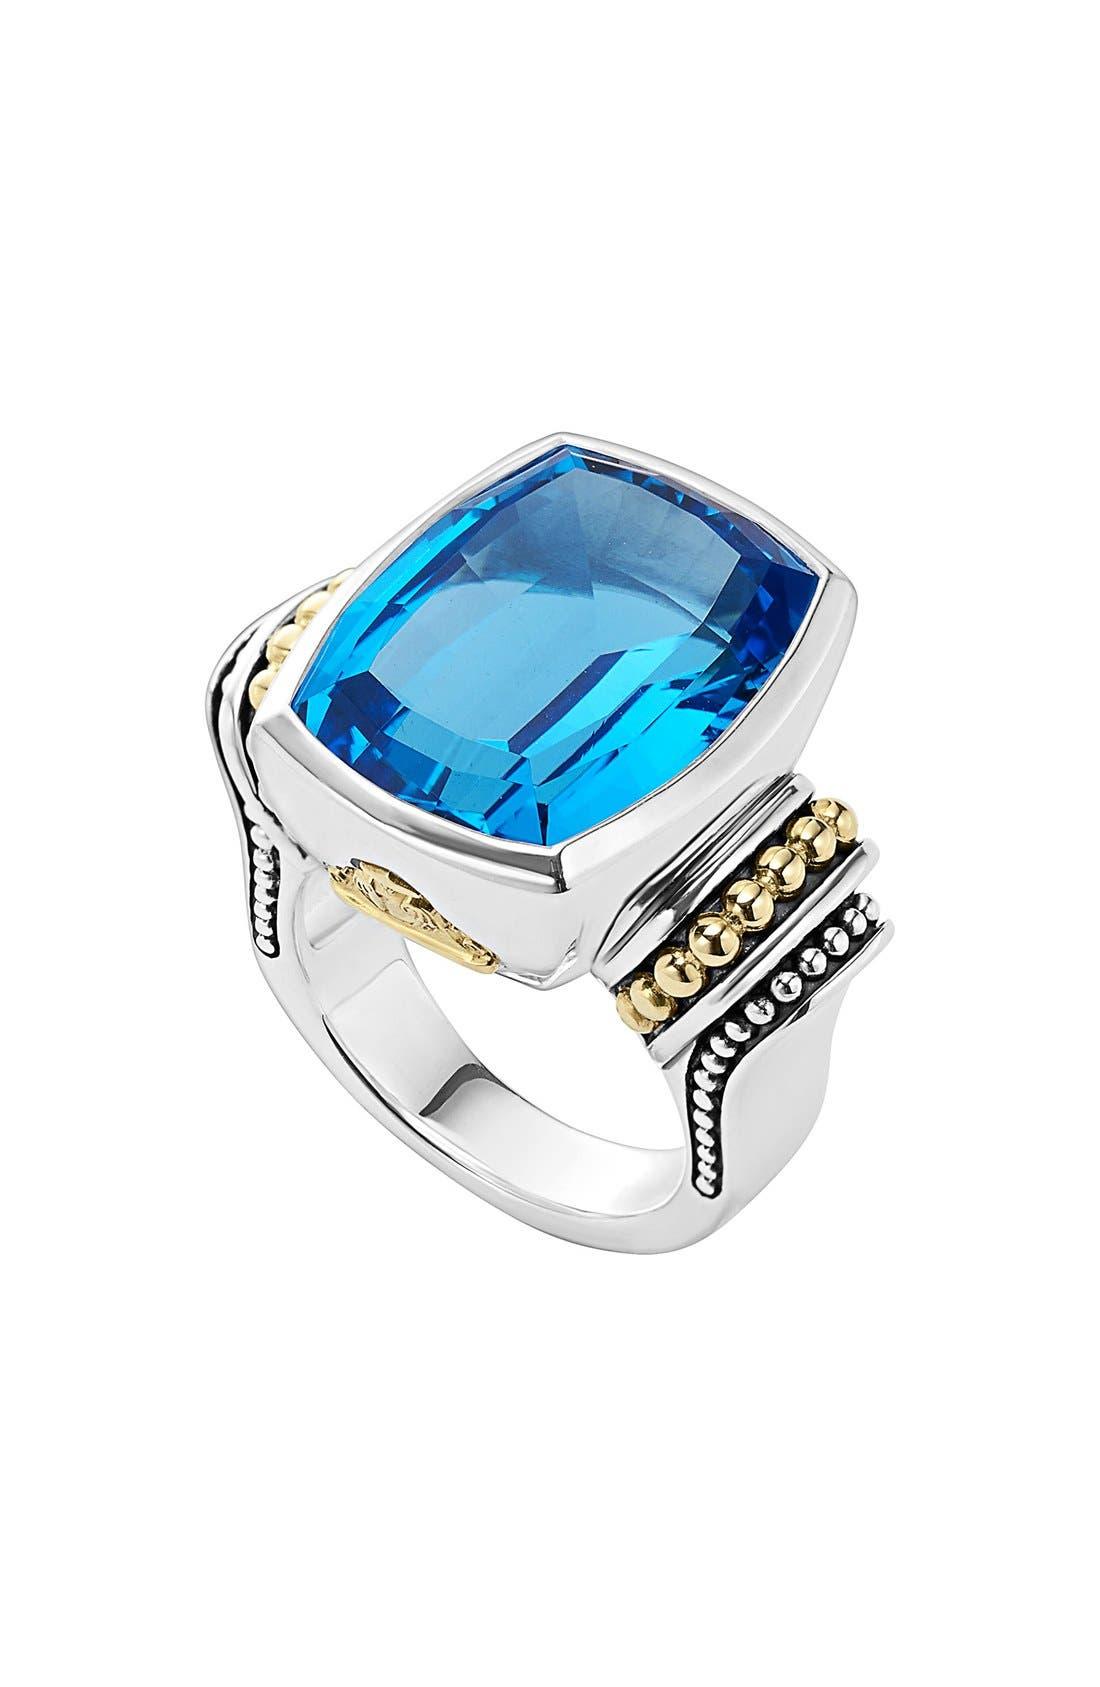 LAGOS Caviar Color Large Semiprecious Stone Ring